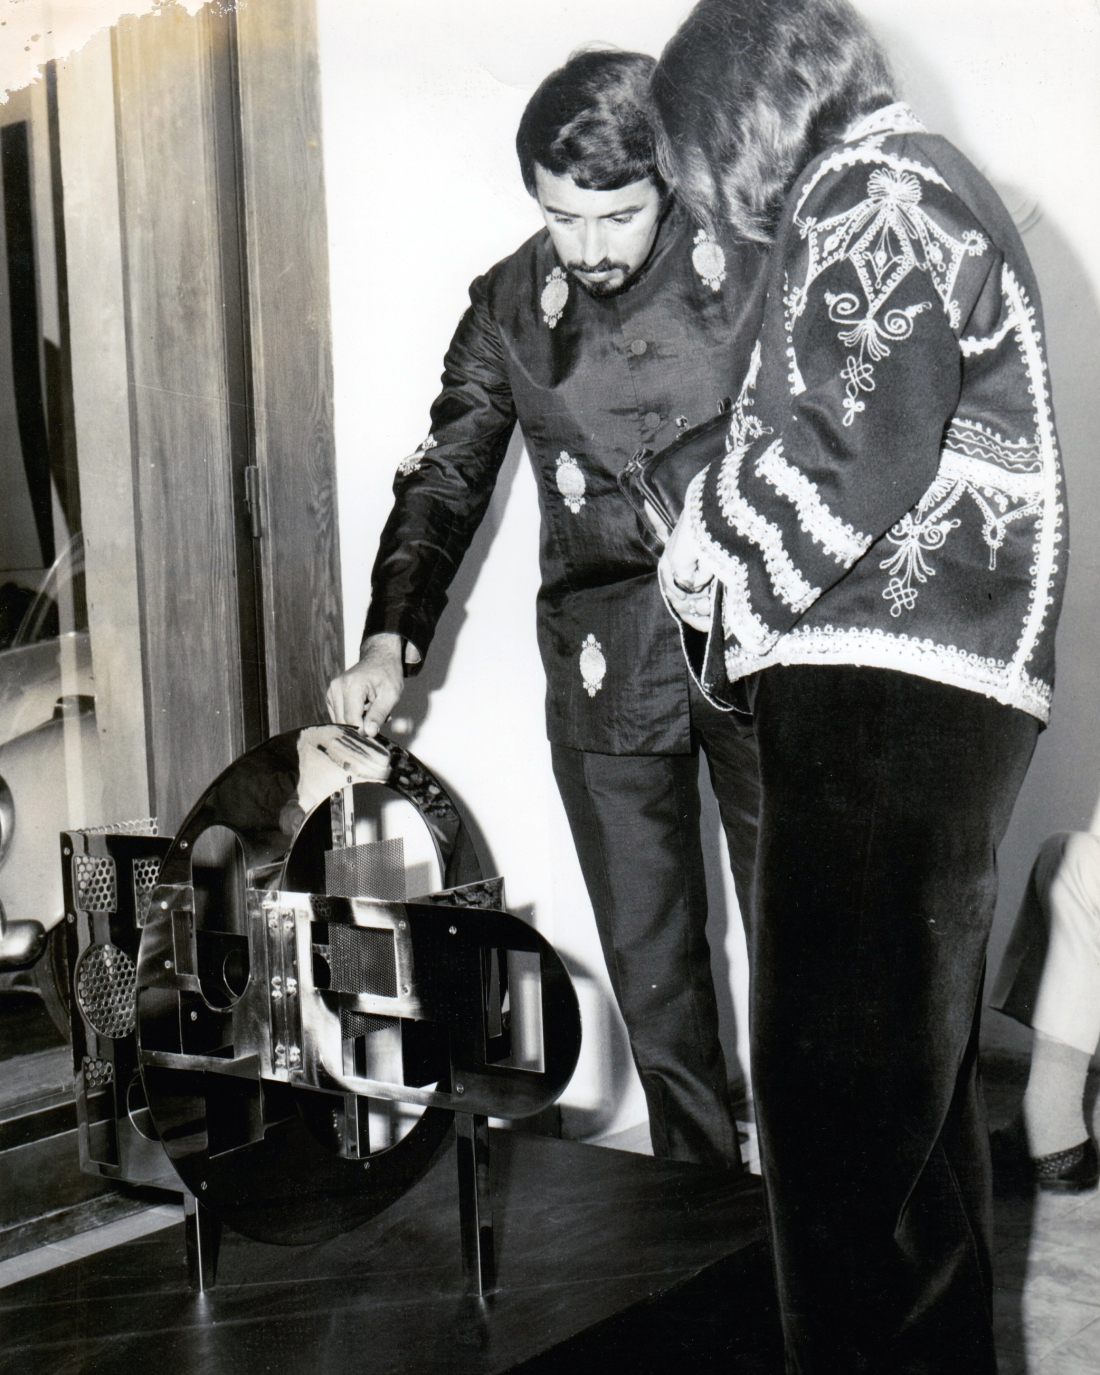 nicolas-schoffer-studio-farnese-lux-11-1969